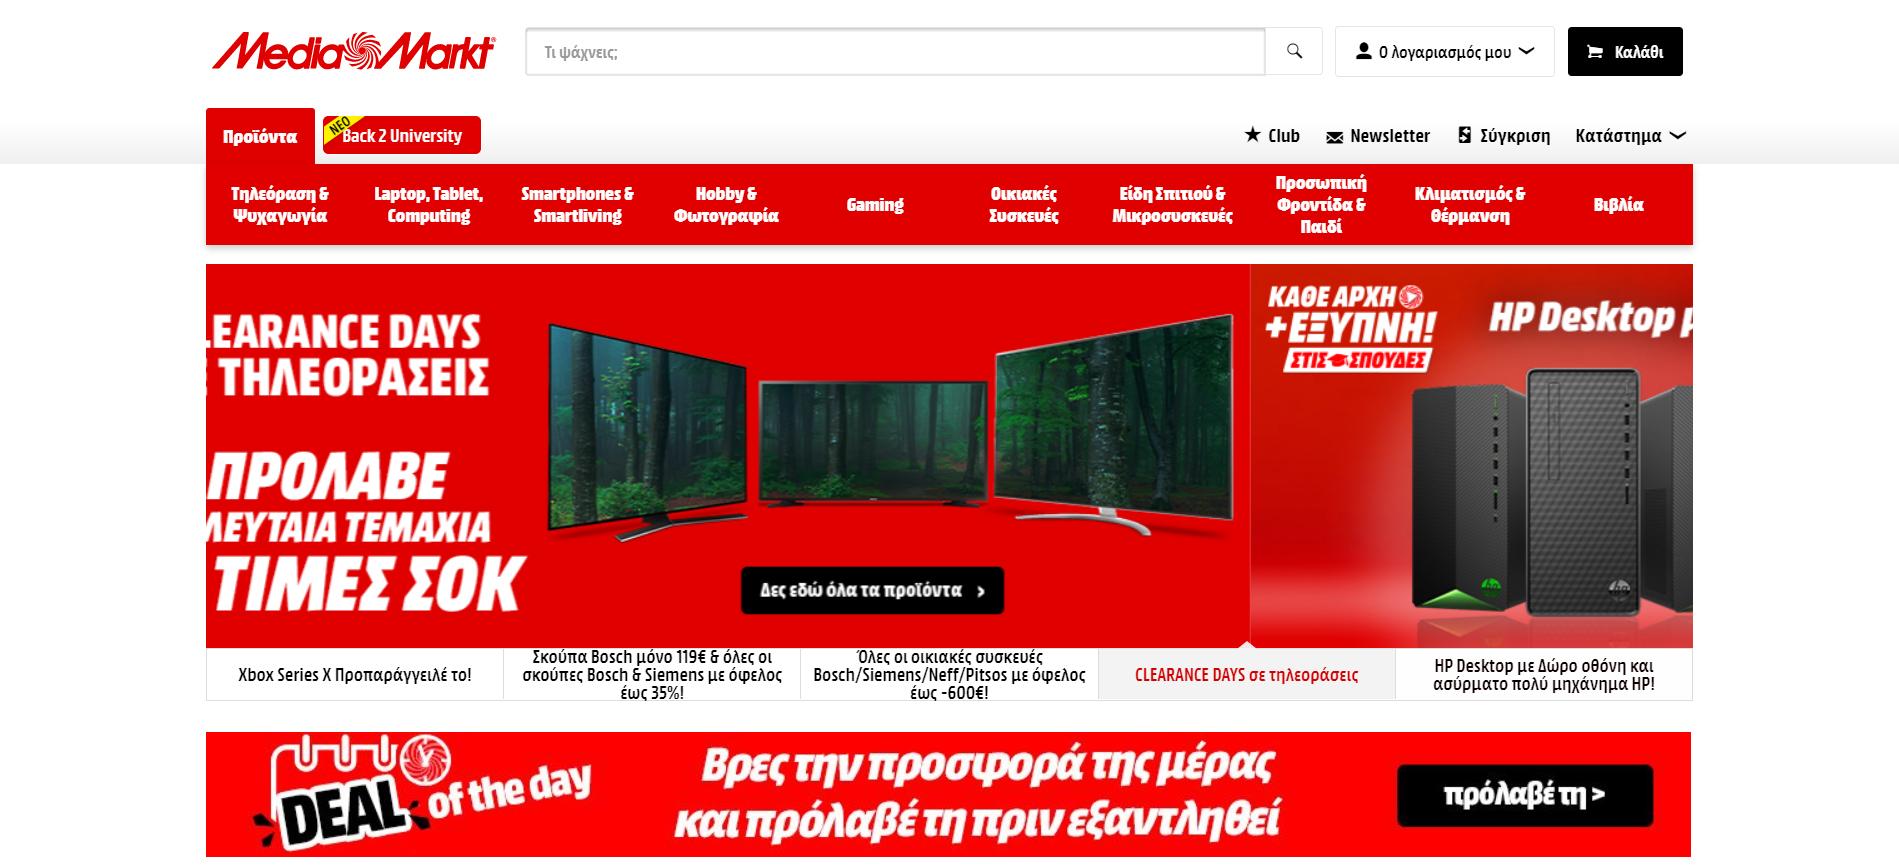 Media Markt Αναλώσιμα Υπολογιστών